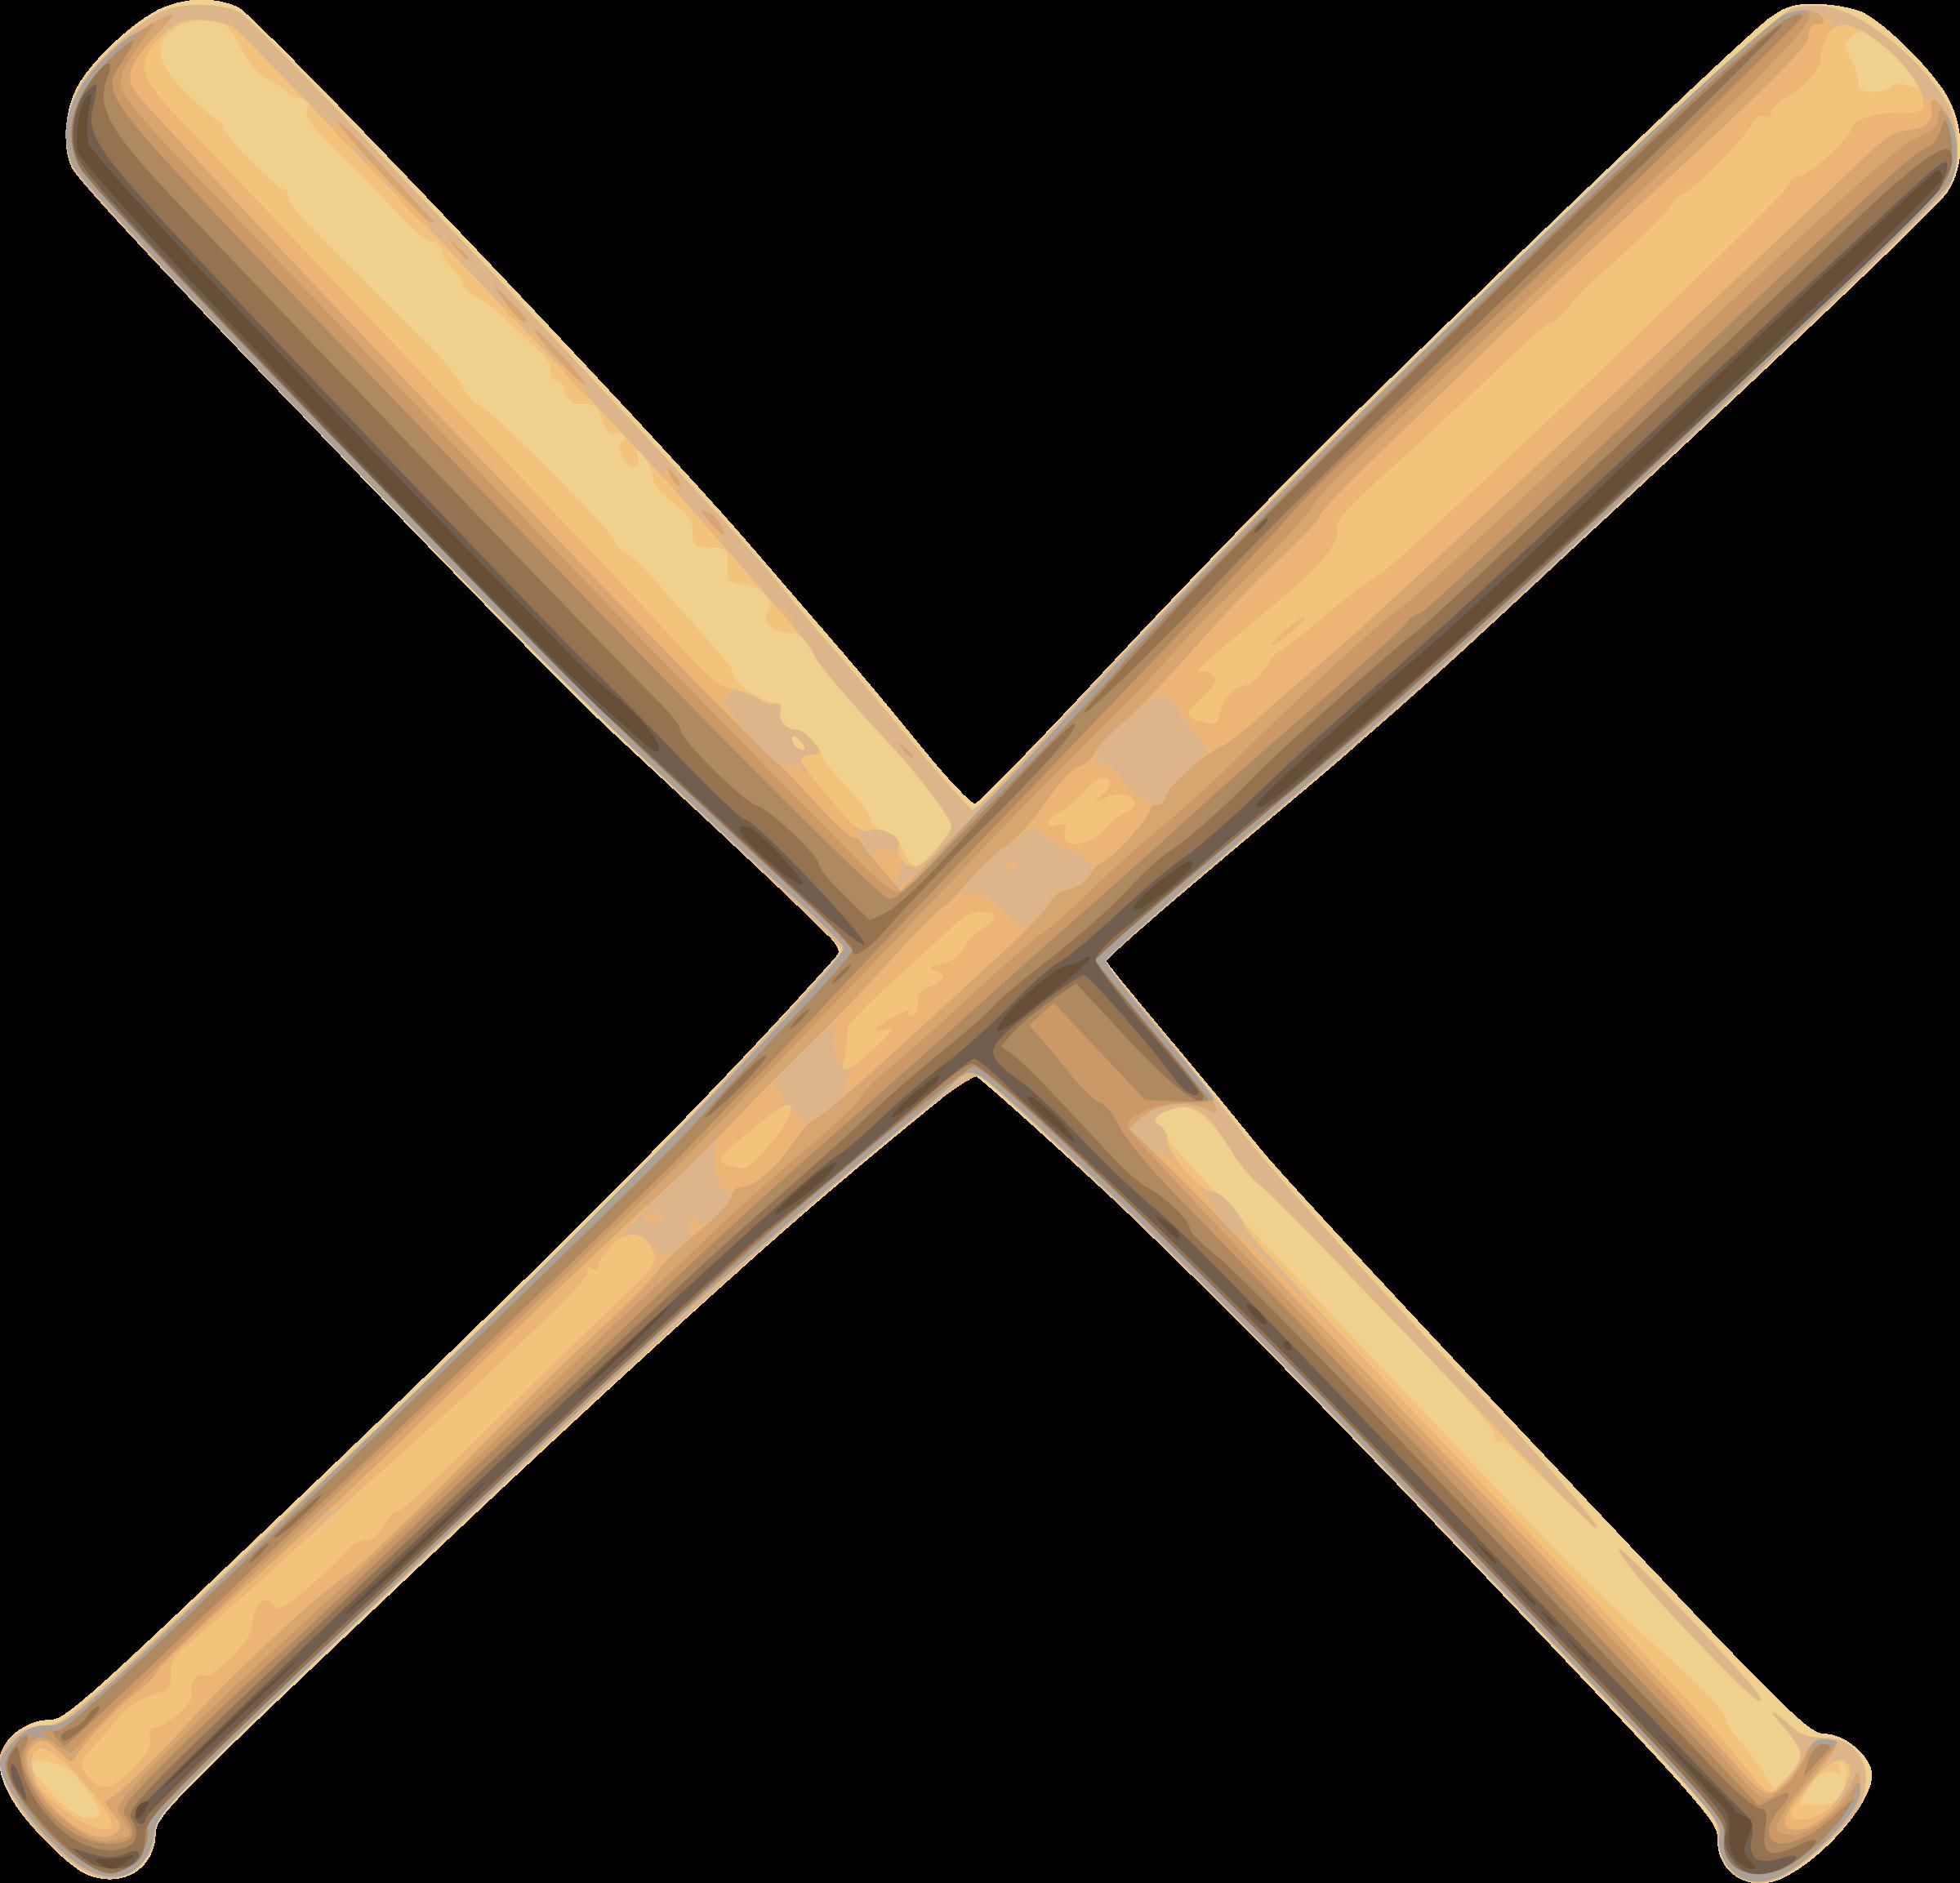 Crossed bats image png. Big clipart baseball bat